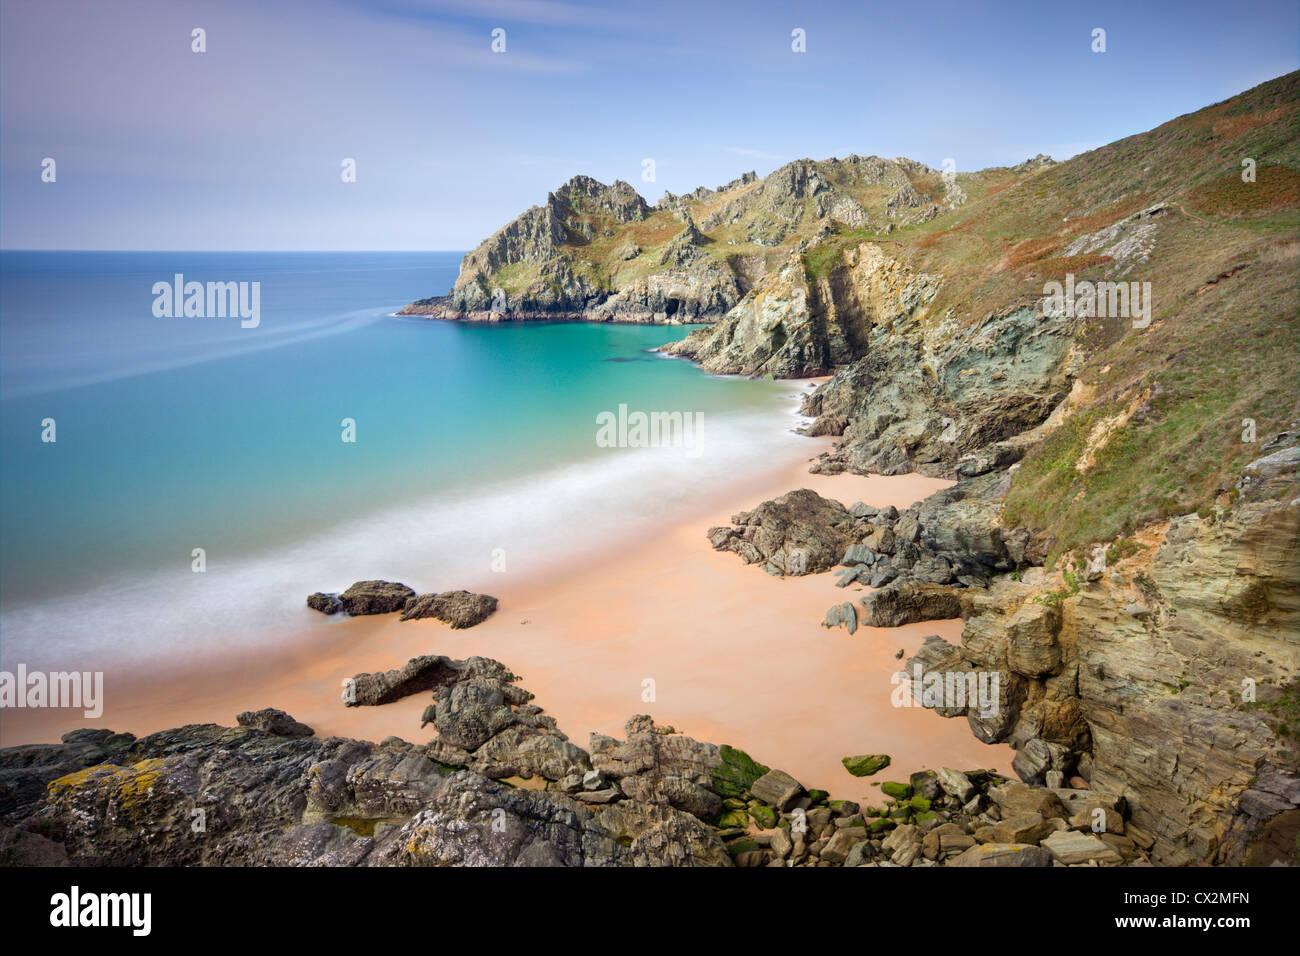 Pristine sandy beach at Elender Cove, looking towards Gammon Head, Salcombe, South Hams, Devon, England. - Stock Image